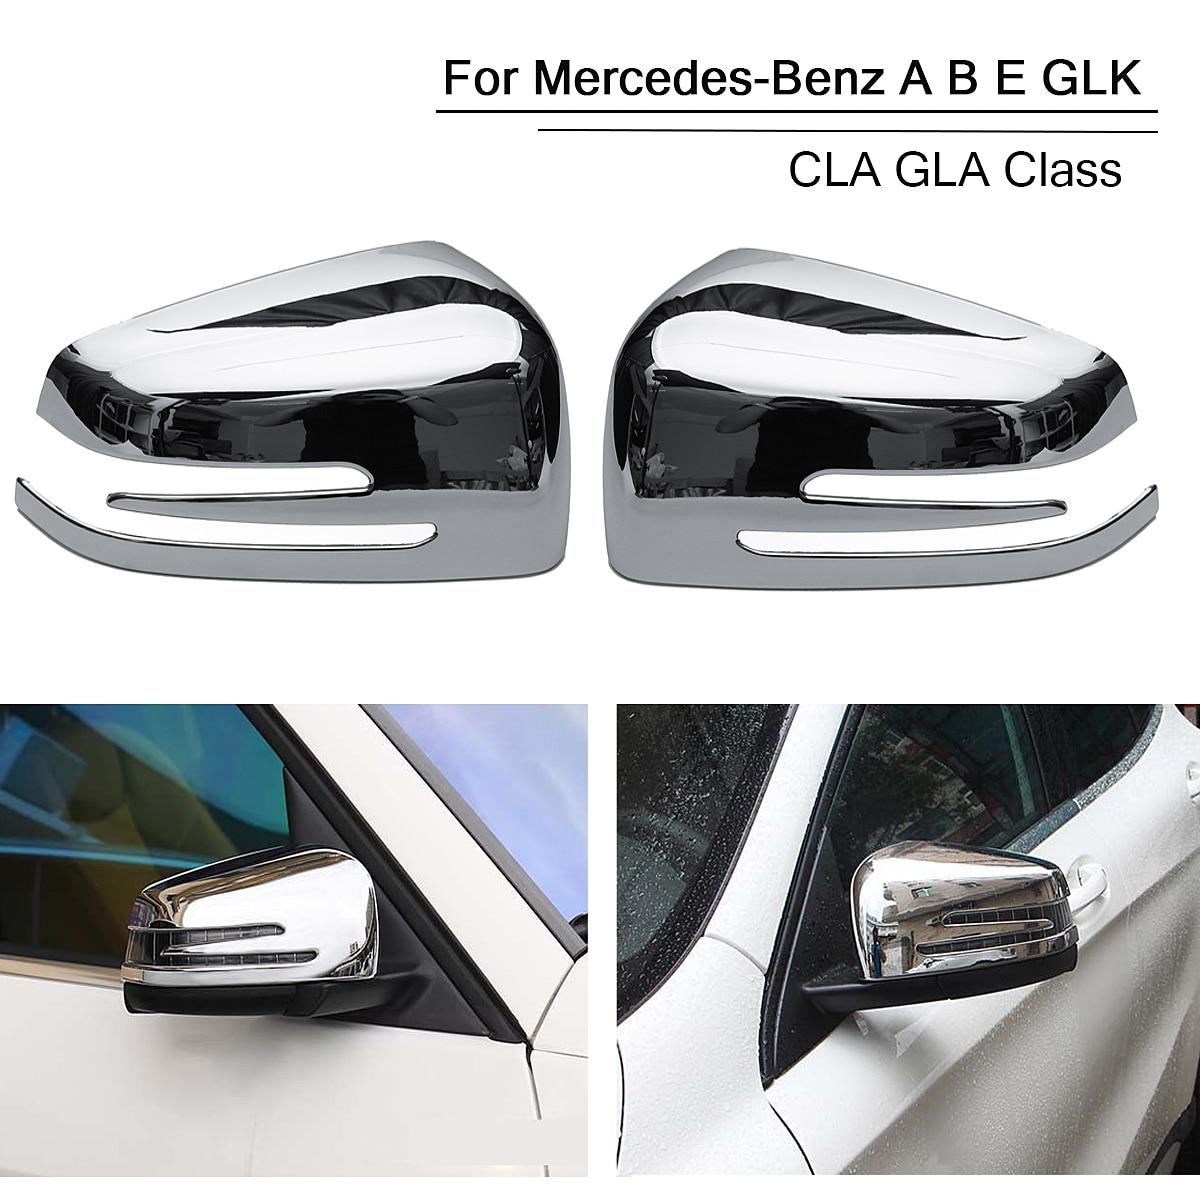 2pcs Right Left Car Rear View Mirror Cover For Mercedes for Benz A B E GLK CLA GLA Class Chrome